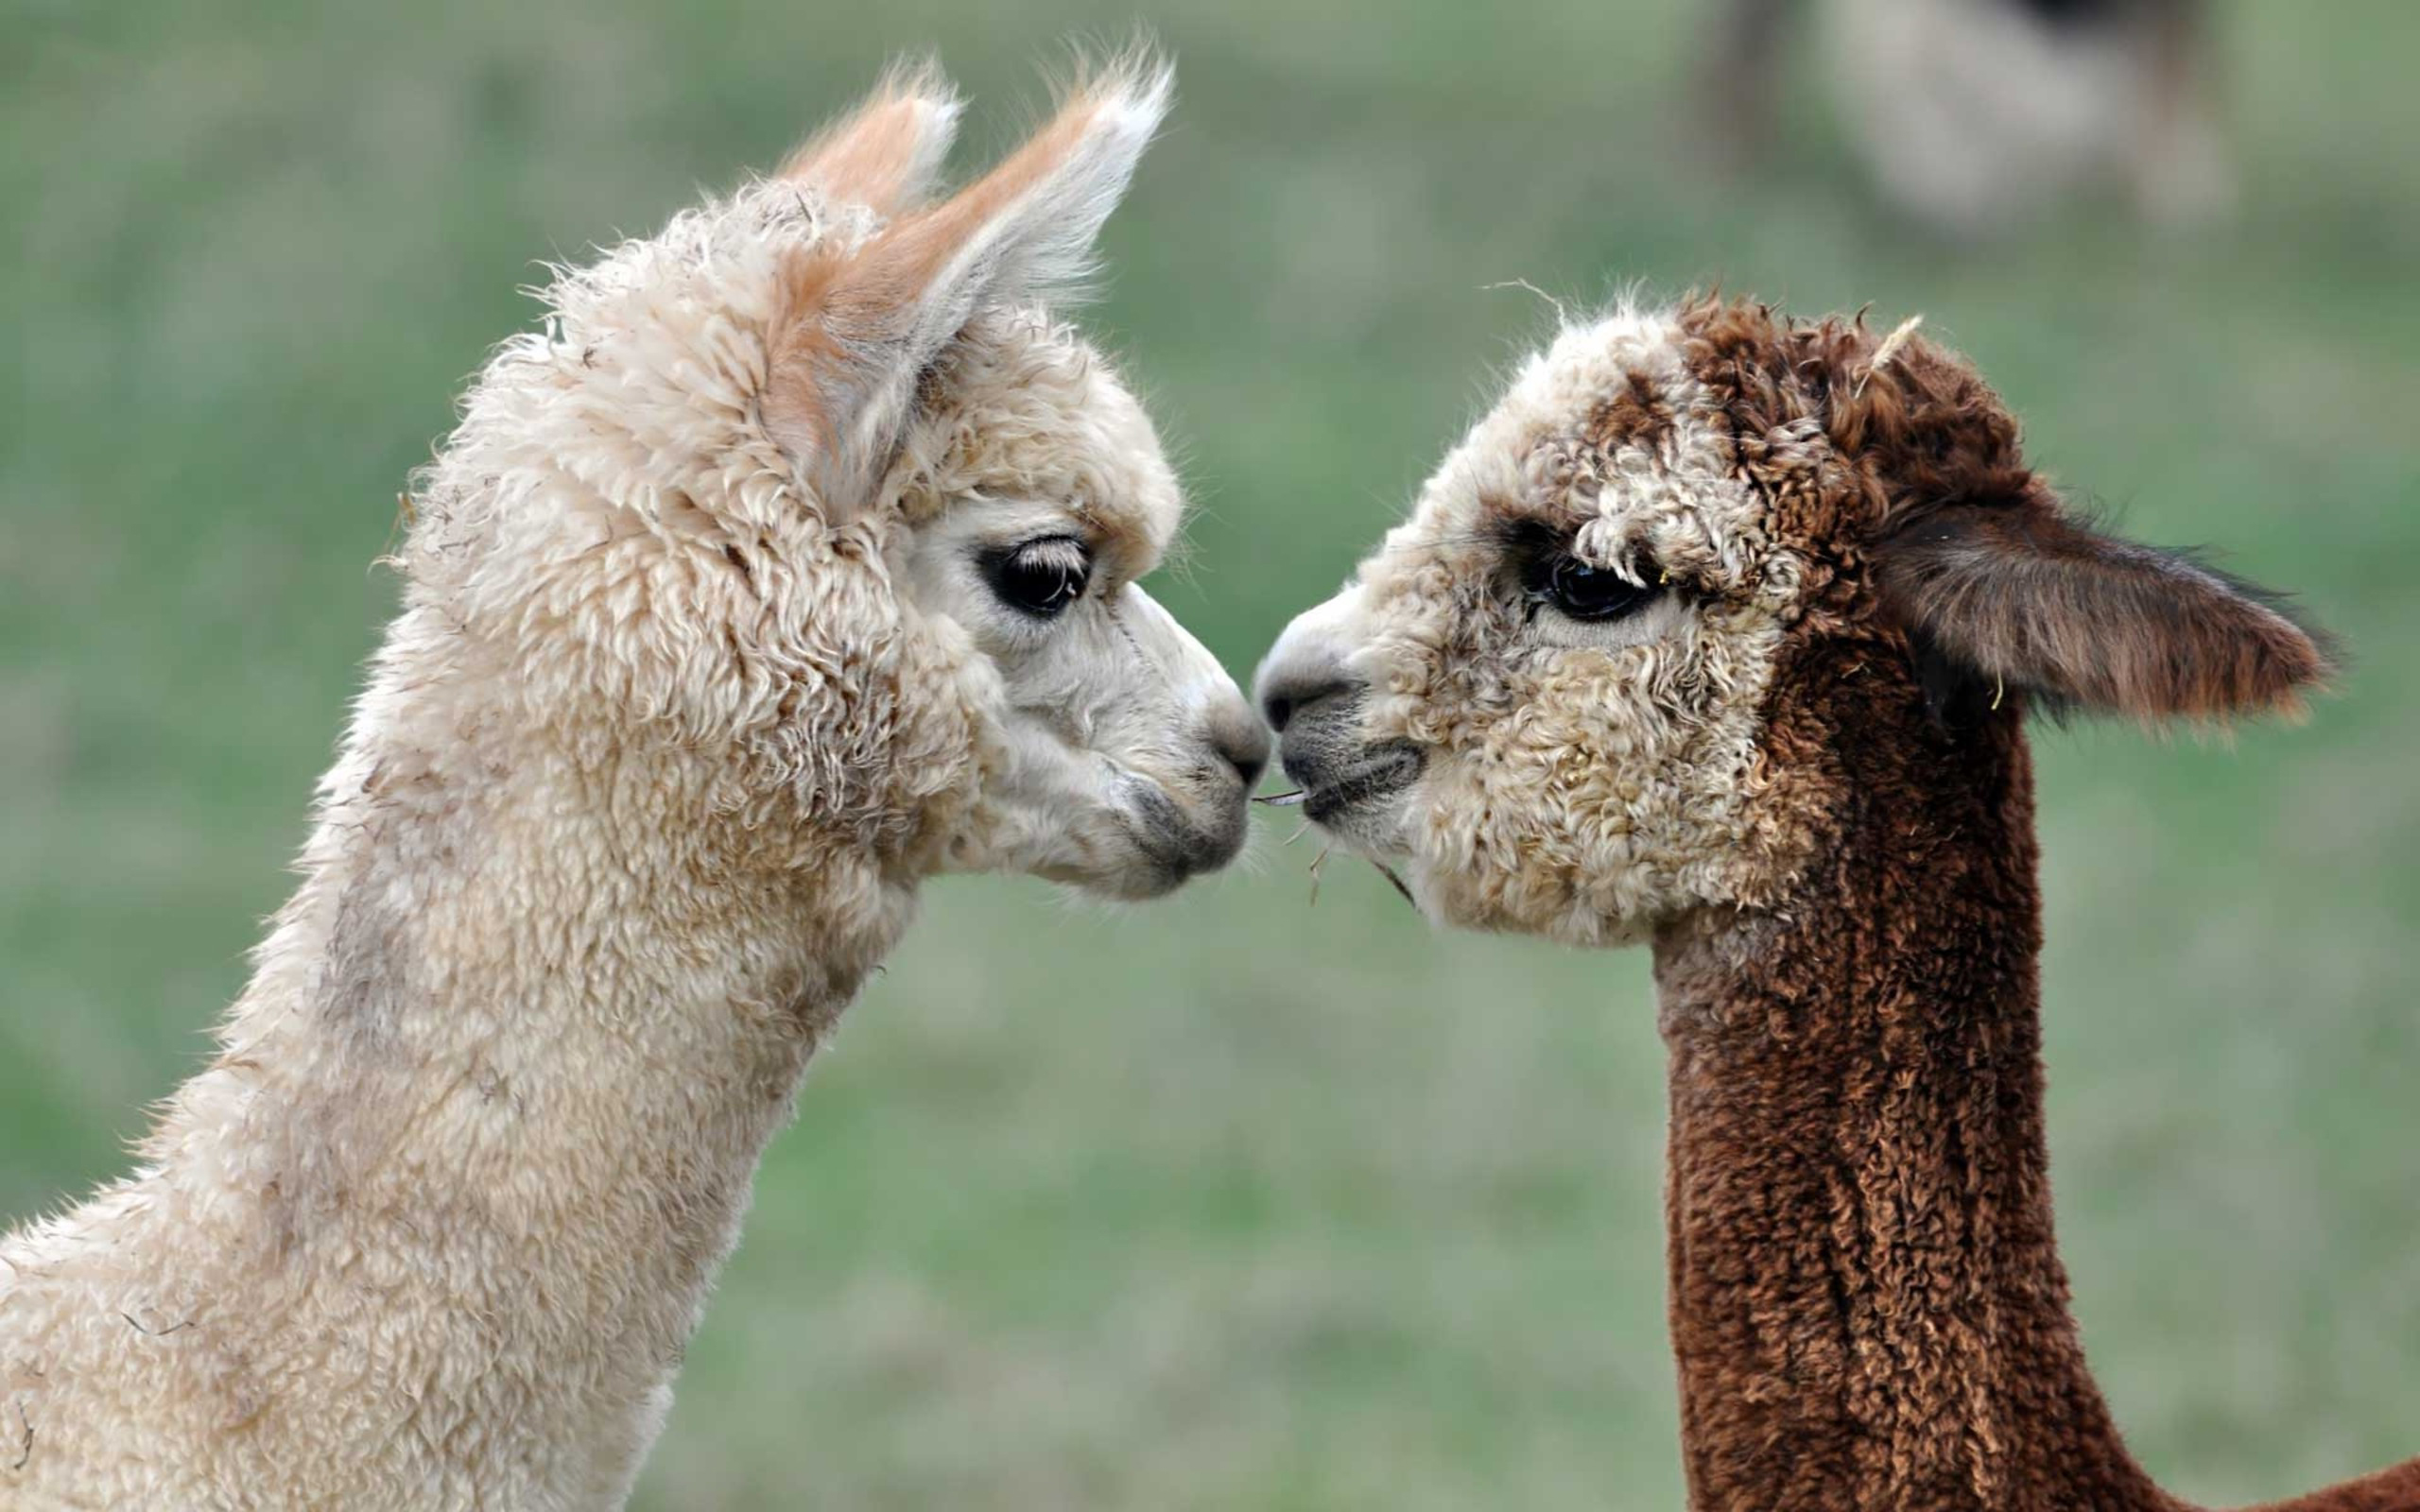 Benefits of Alpaca Fibers